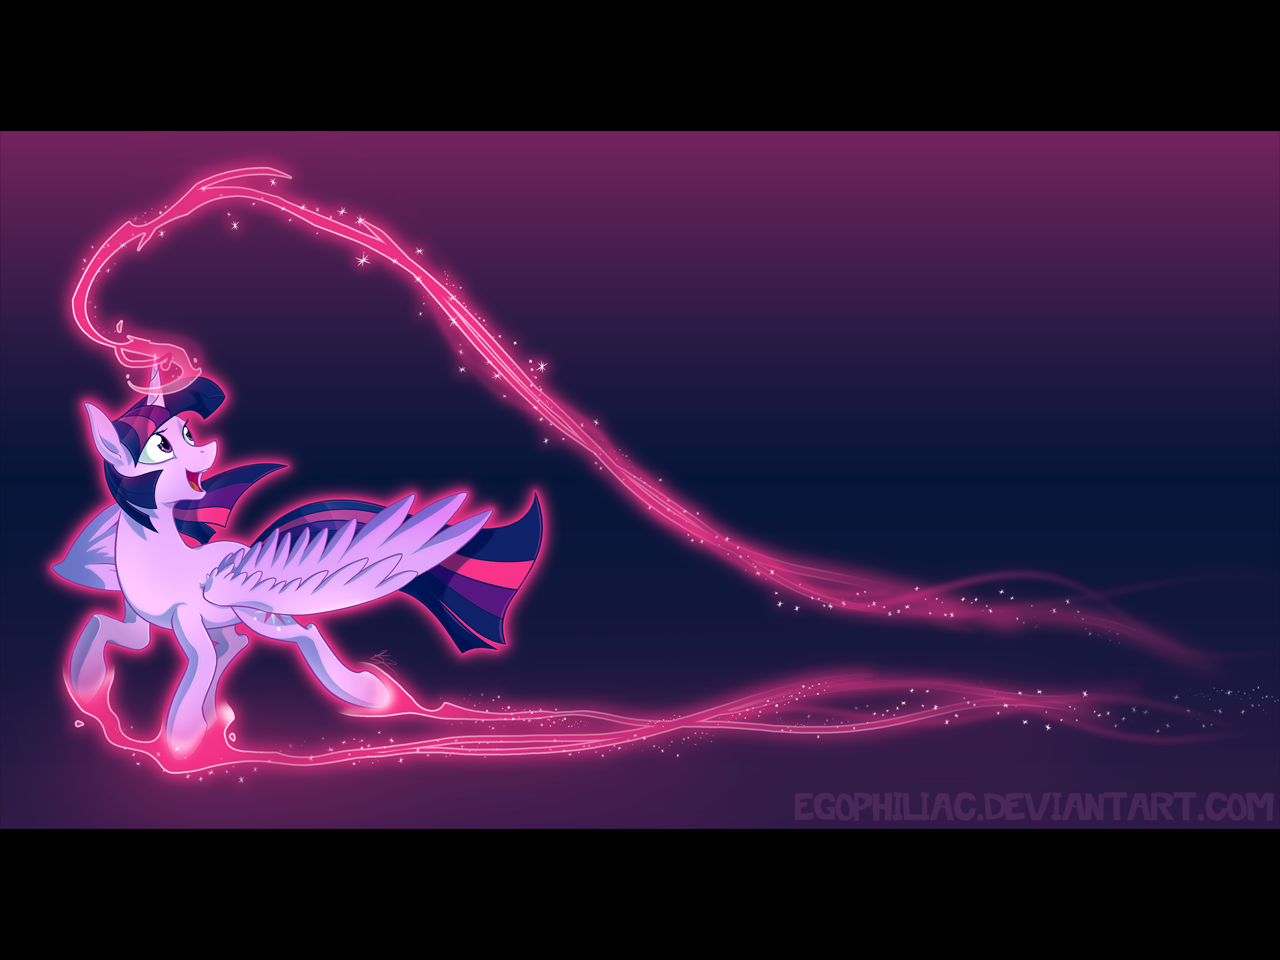 twilight sparkles - wallpaper by egophiliac